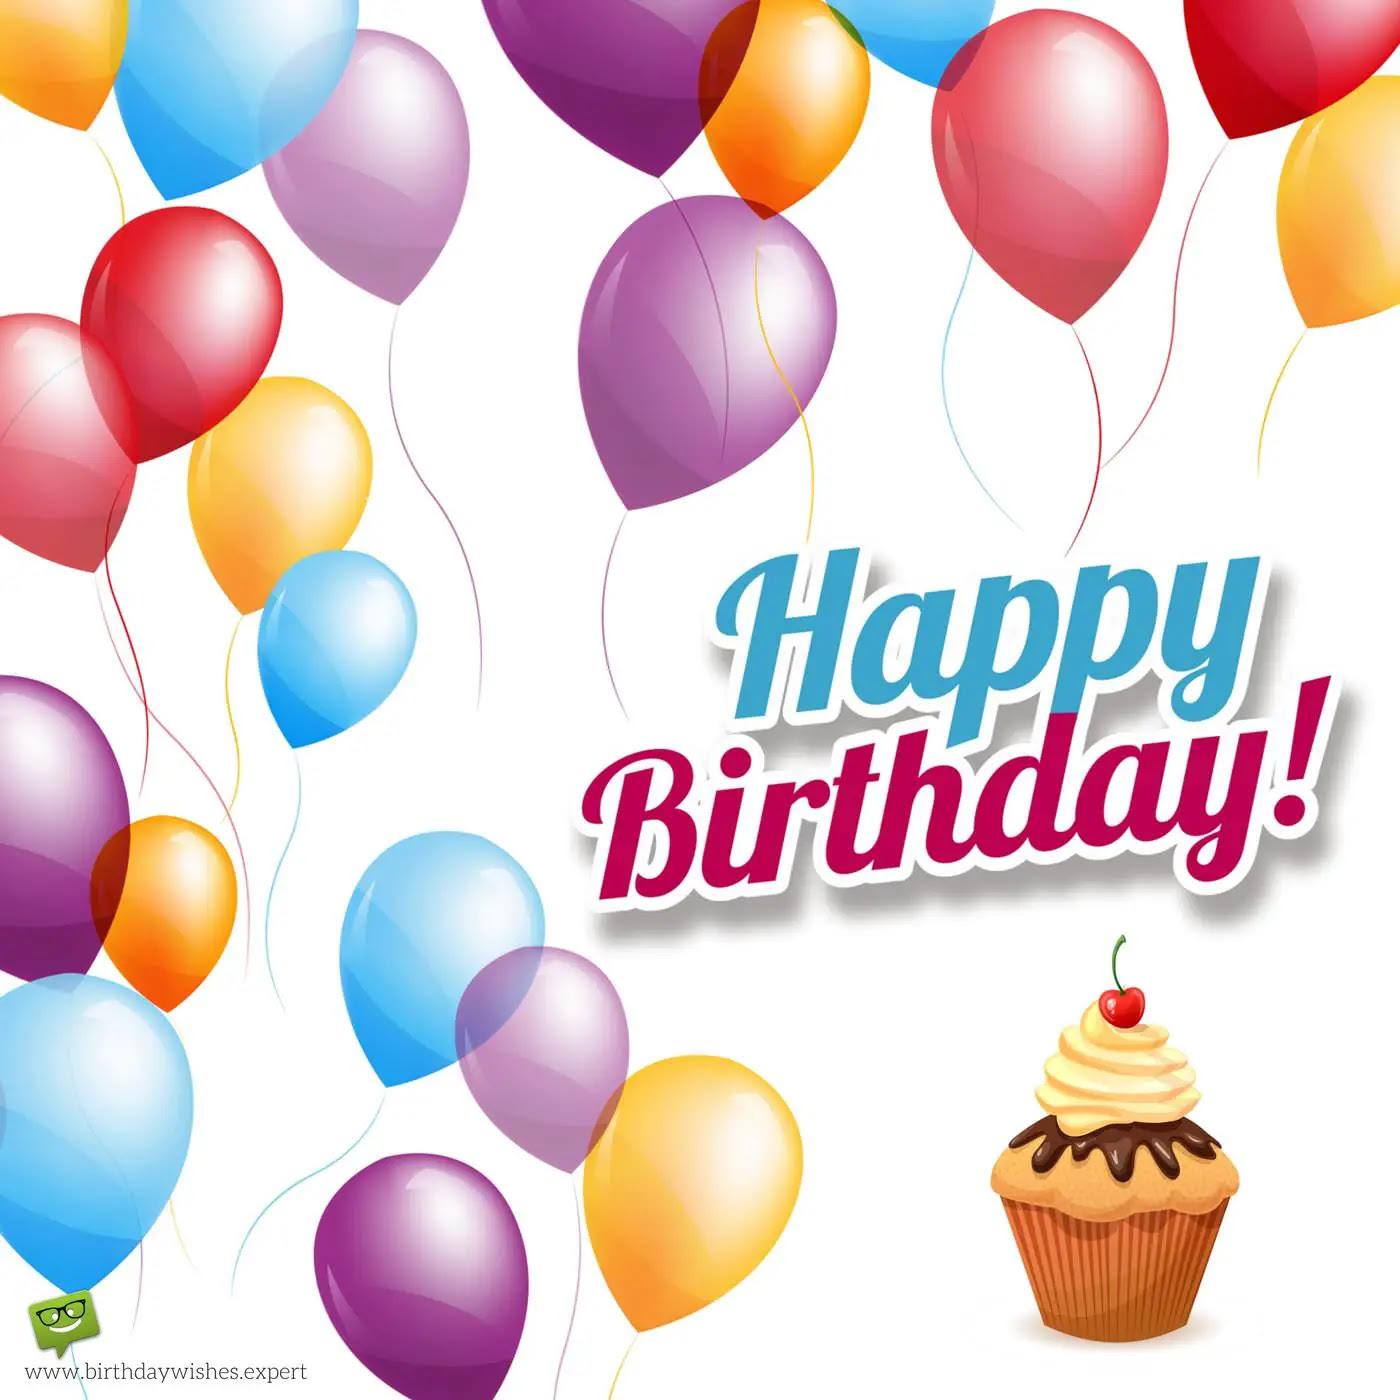 Pictures Of Childs Birthday Amazing Premiumnet